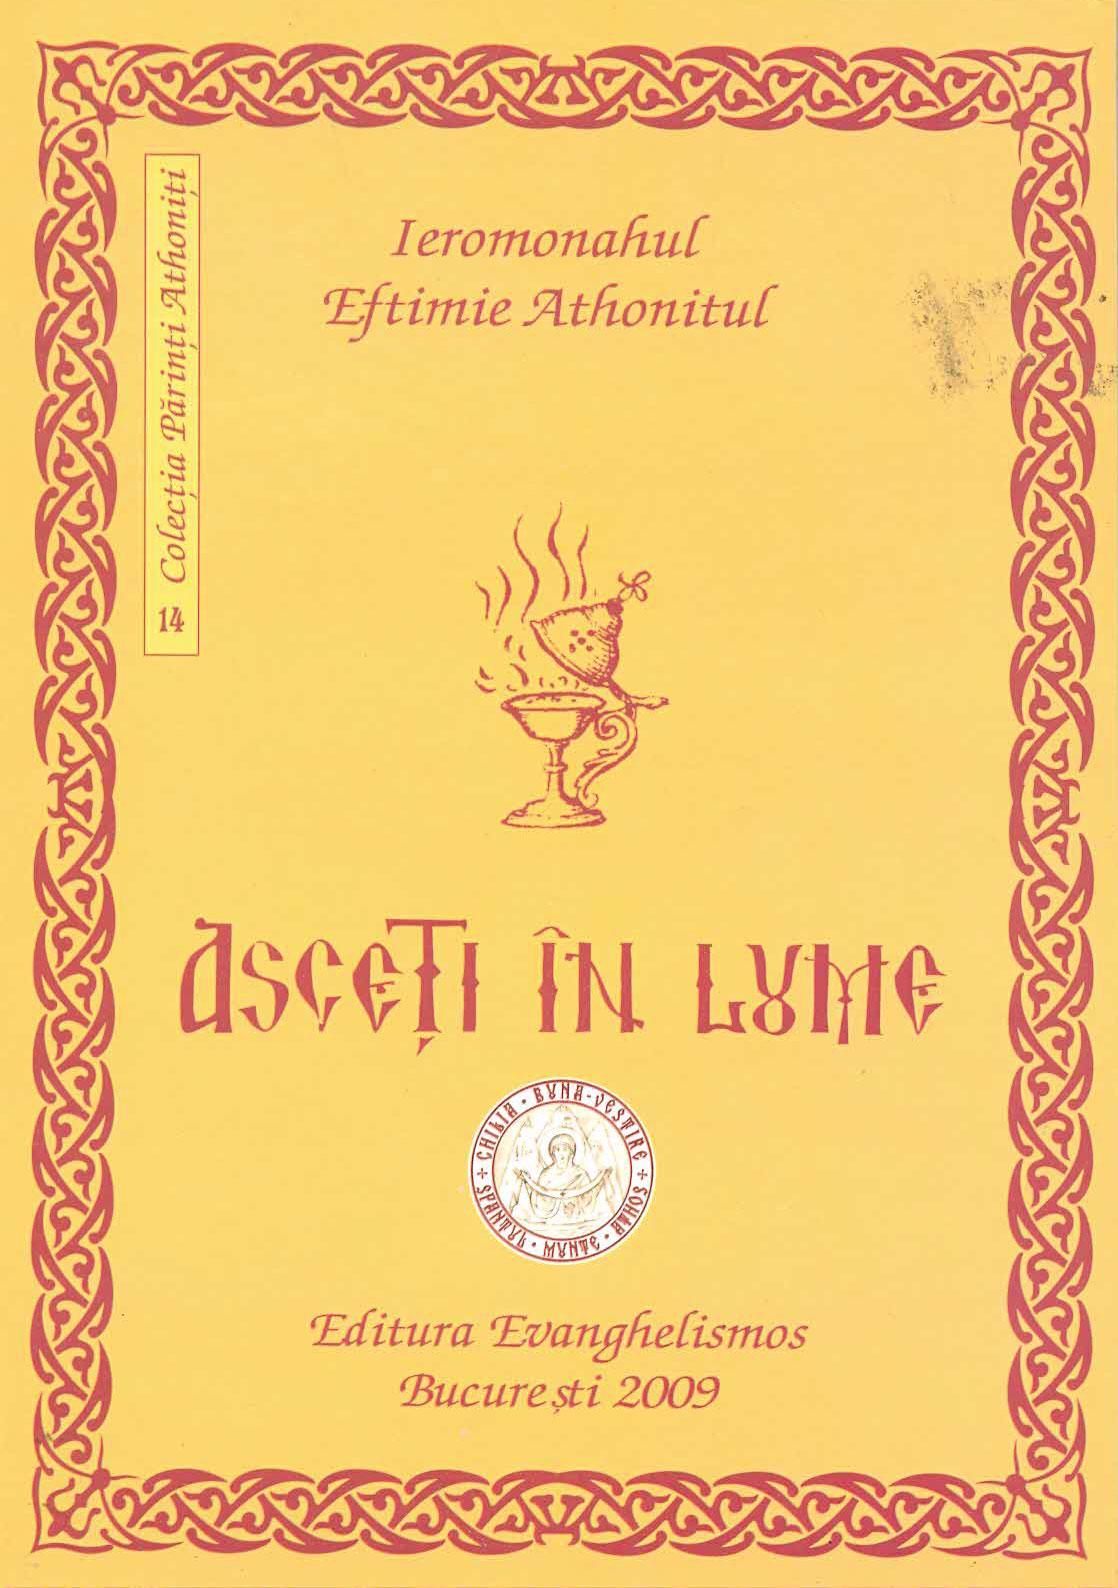 Ieromonahul Eftimie Athonitul - Asceti in lume (I)